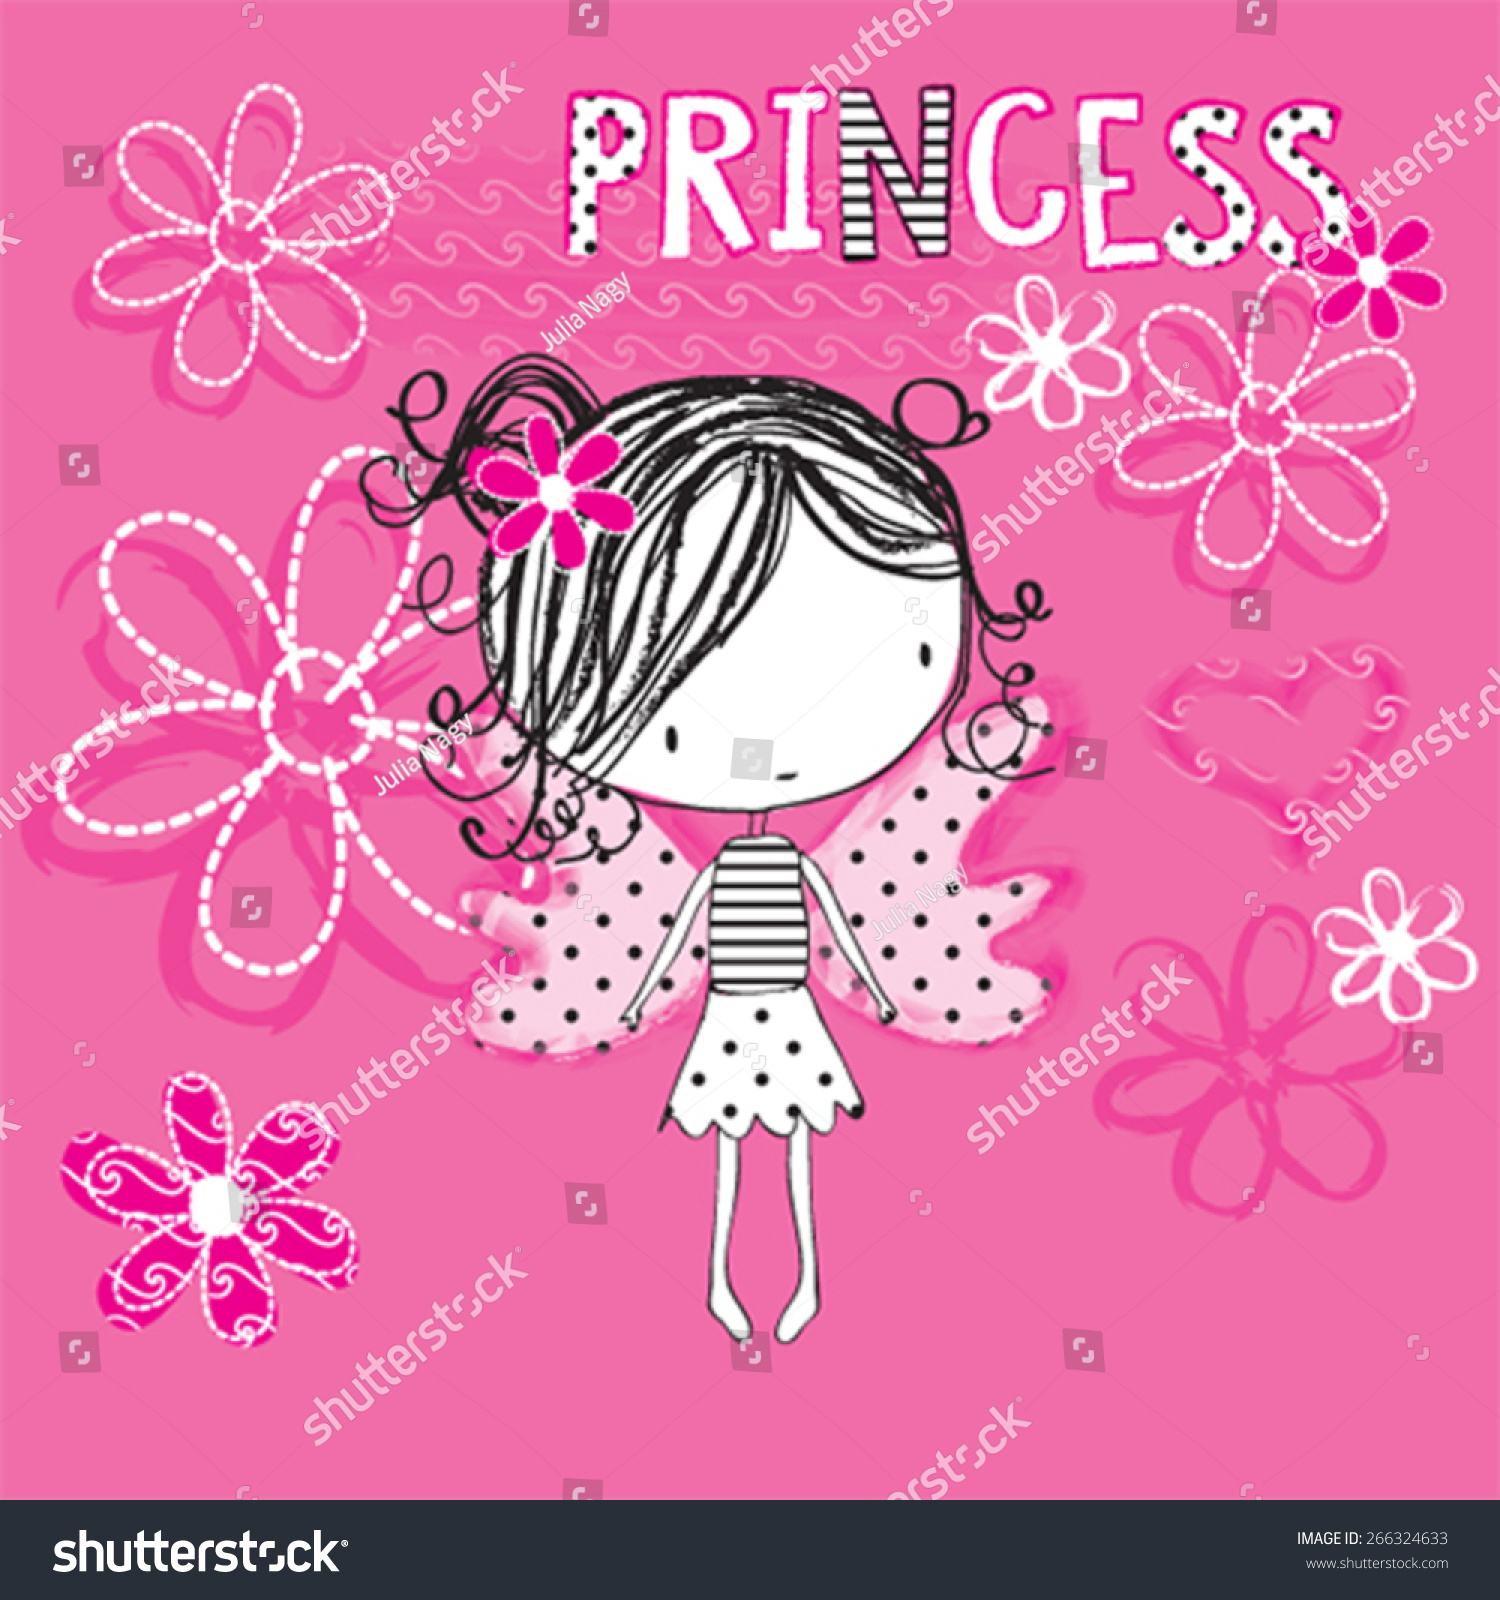 Shirt design in girl - Cute Princess Girl Butterfly Girl T Shirt Design Vector Illustration